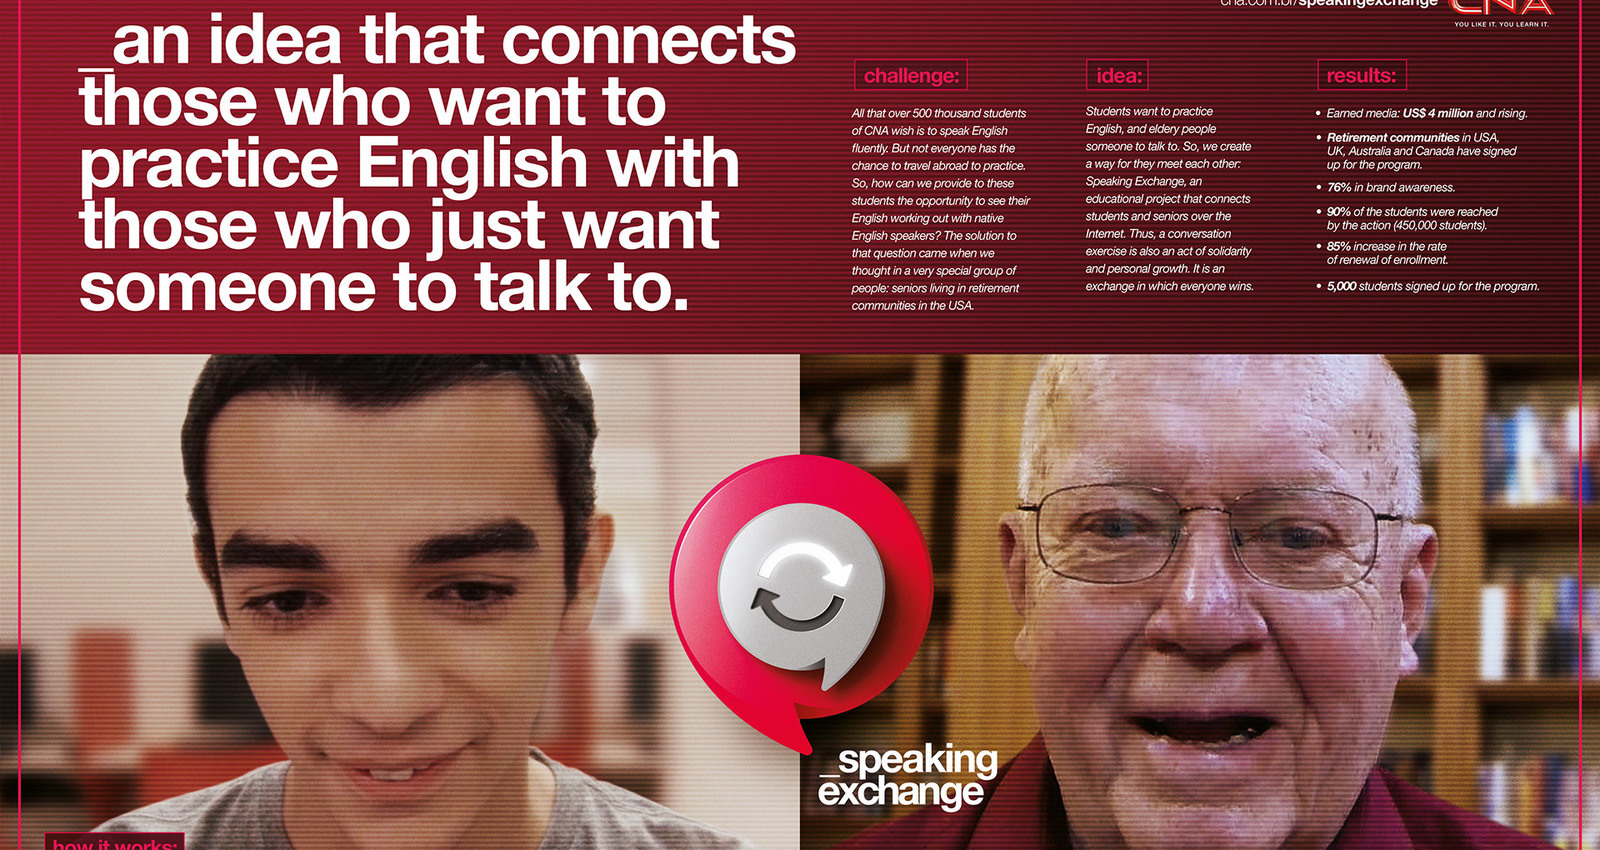 SPEAKING EXCHANGE